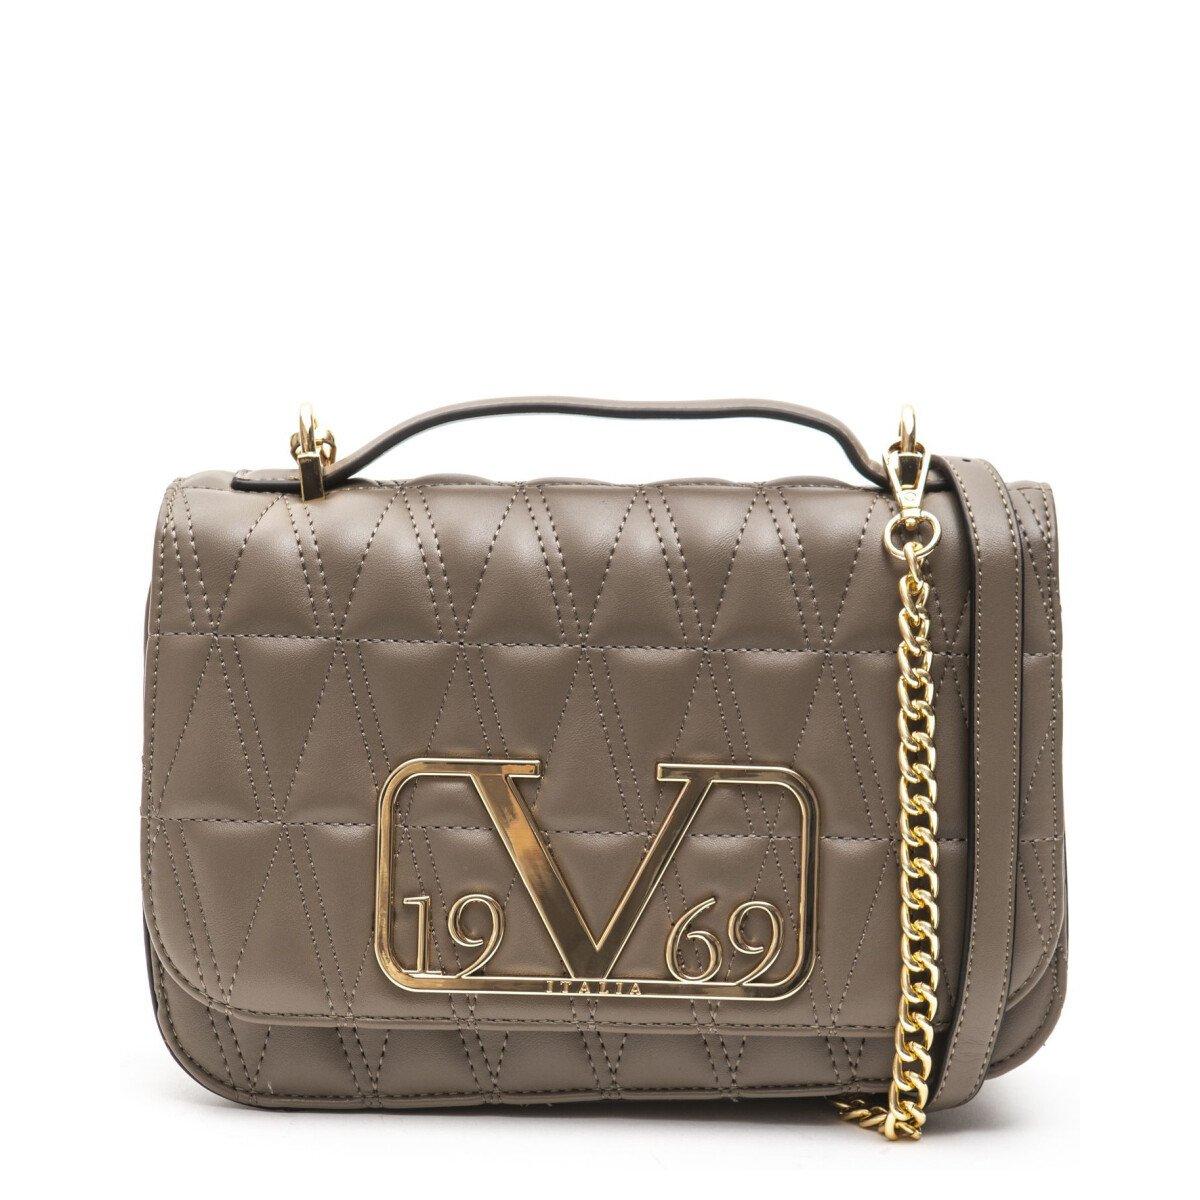 19v69 Italia Women's Shoulder Bag Various Colours 318906 - brown UNICA